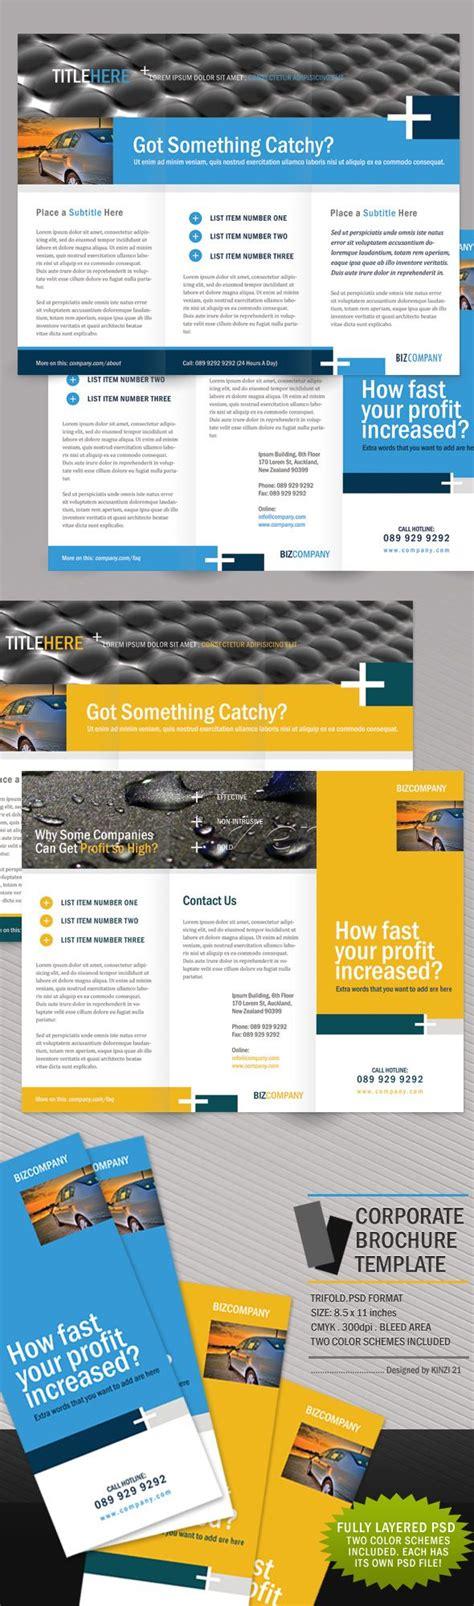 ngo brochure templates best agenda templates